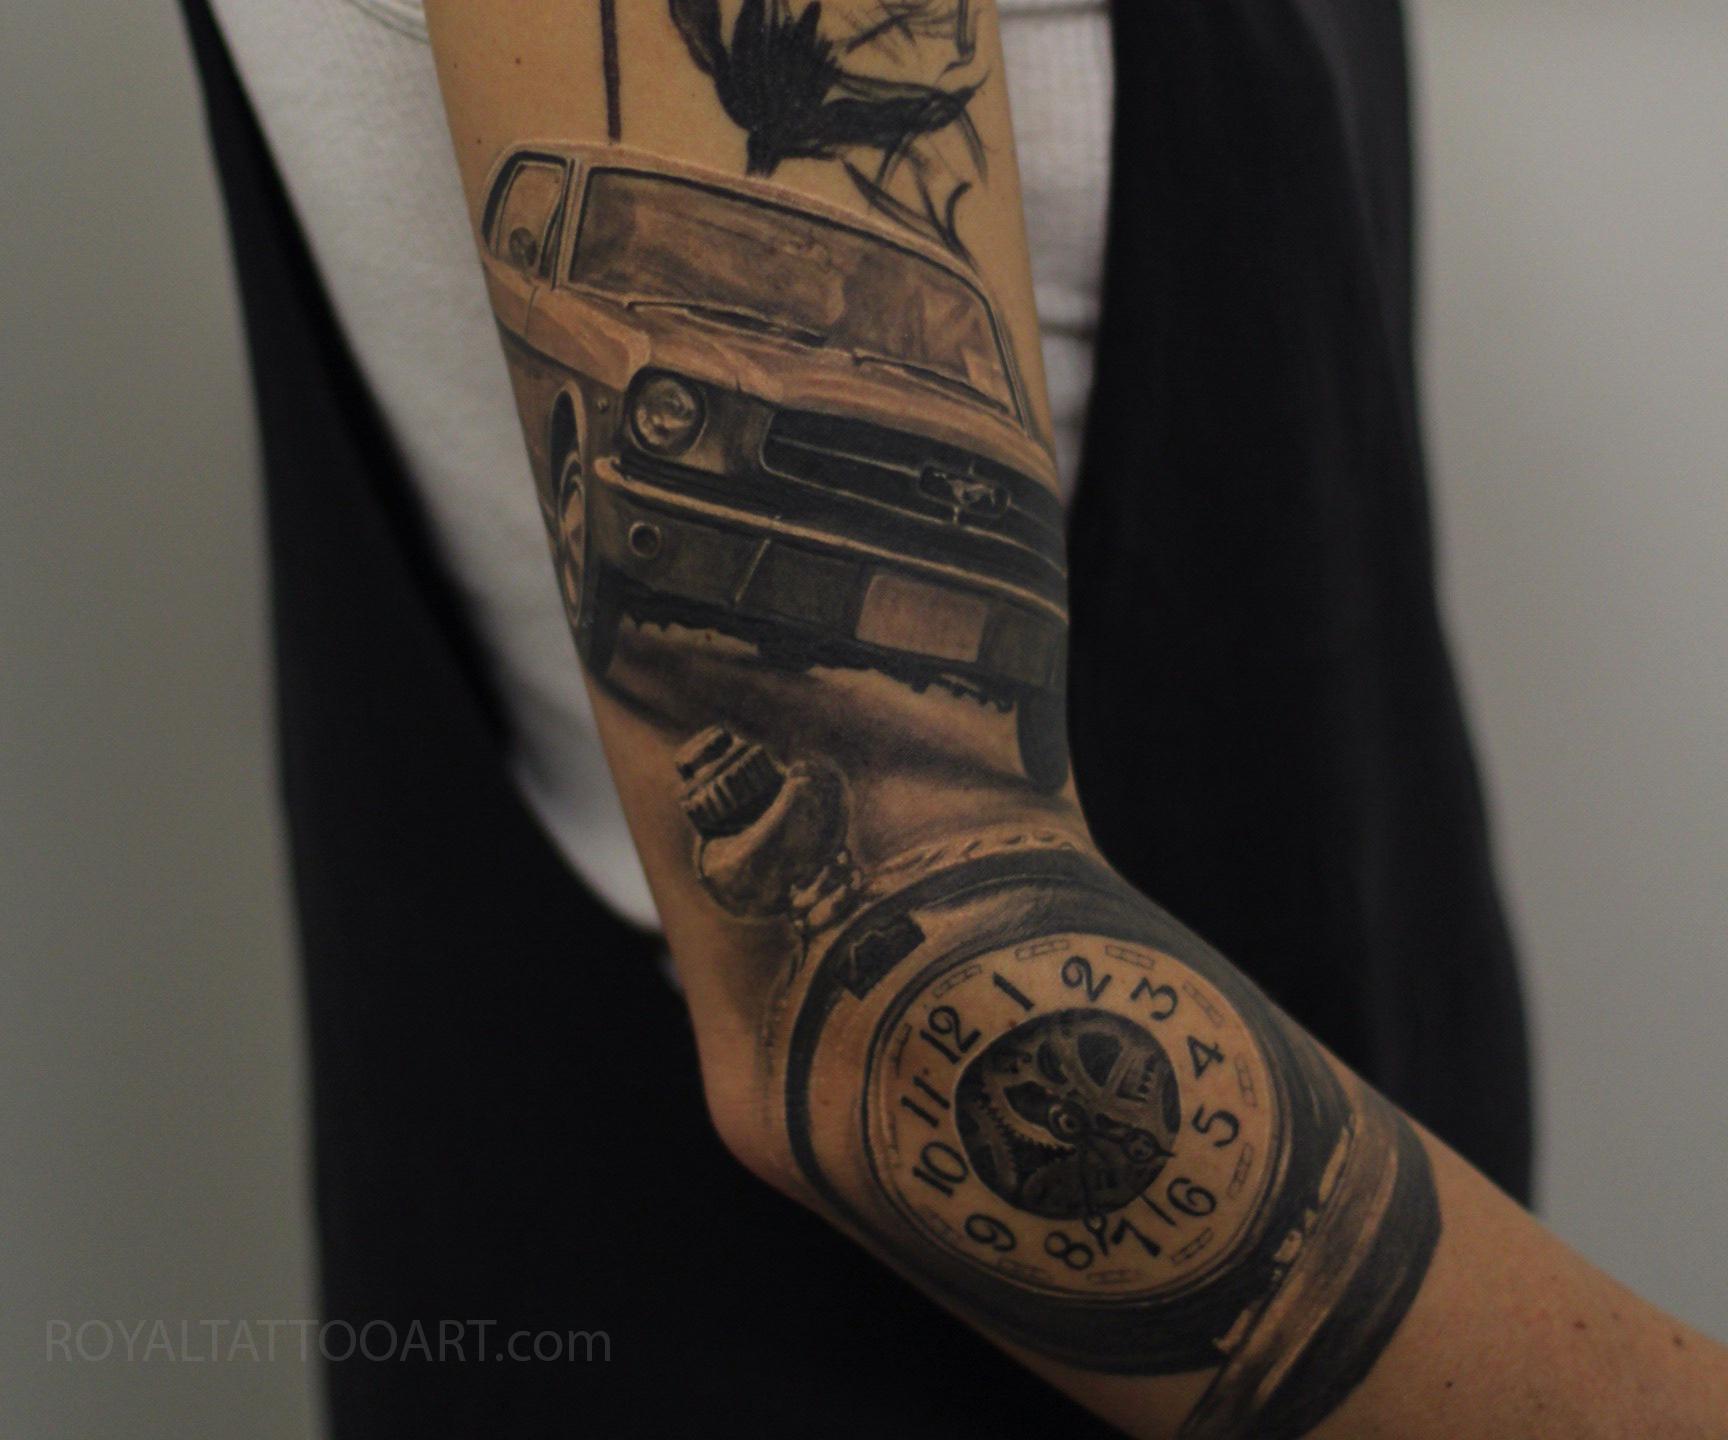 Mustang car Black and gray tattoo watch pocket watch realism photorealism Royal Jafarov nyc new york manhattan